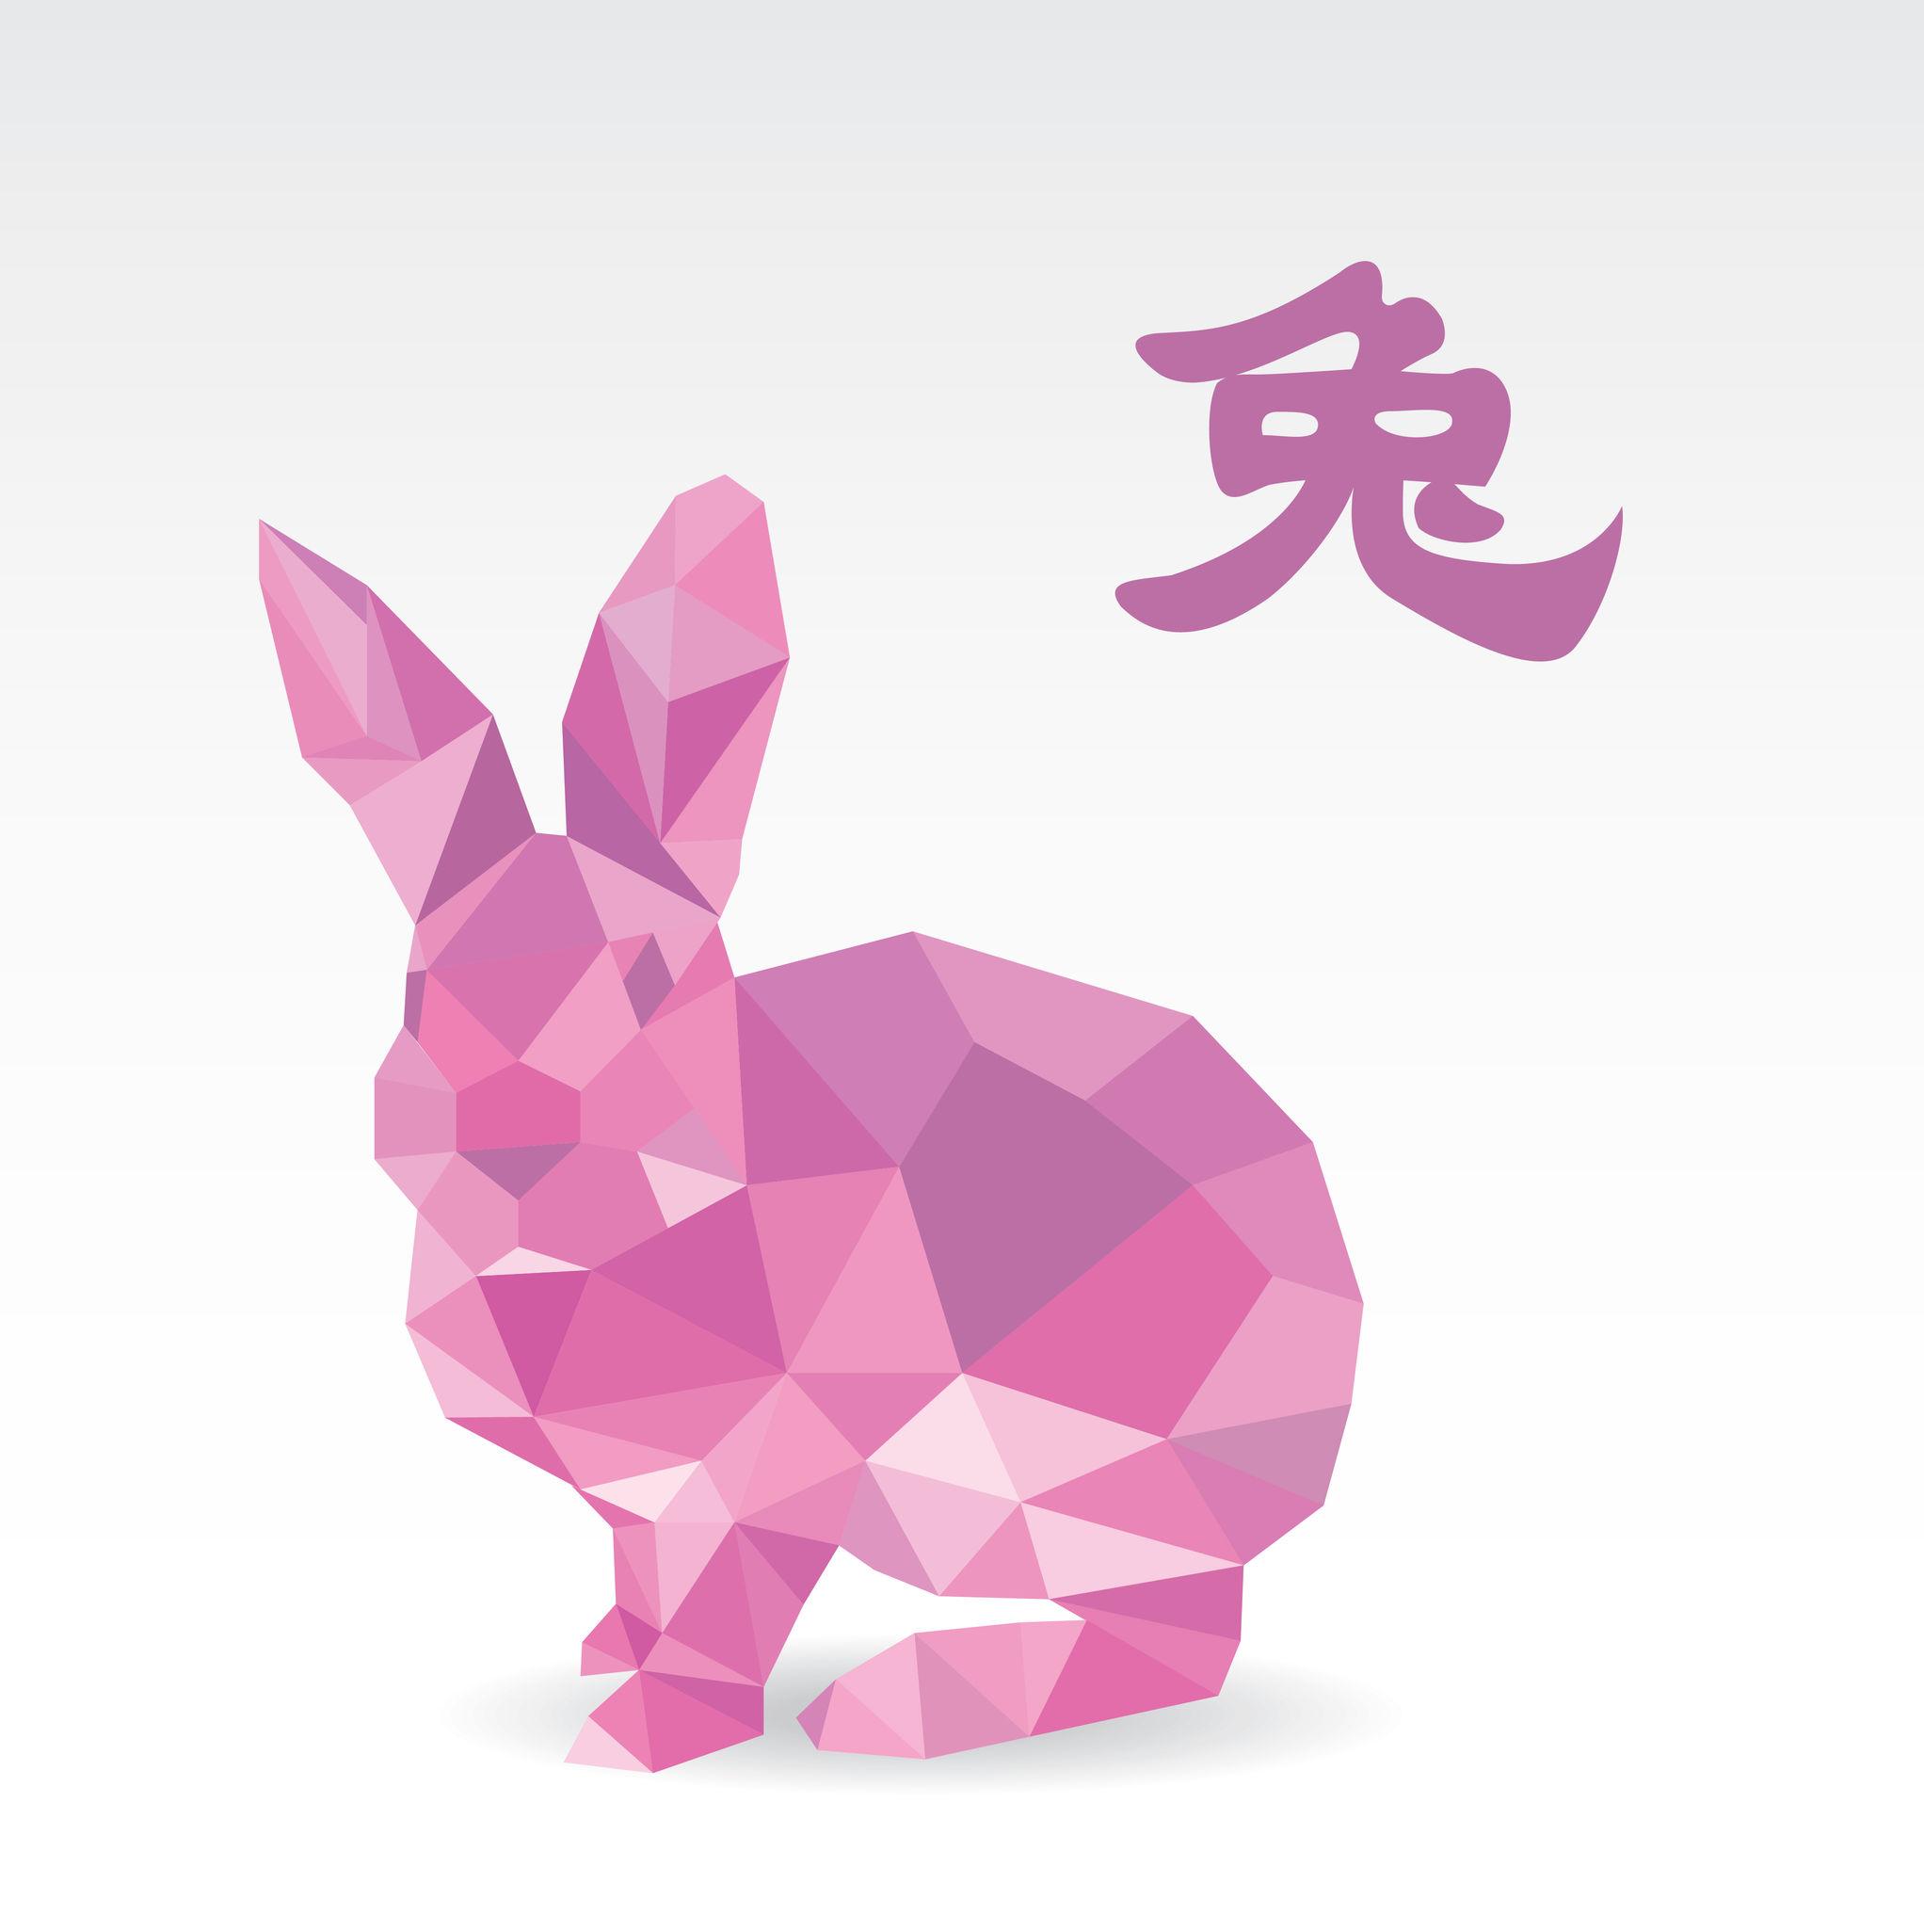 chinese horoscope 2020 prediction rabbit